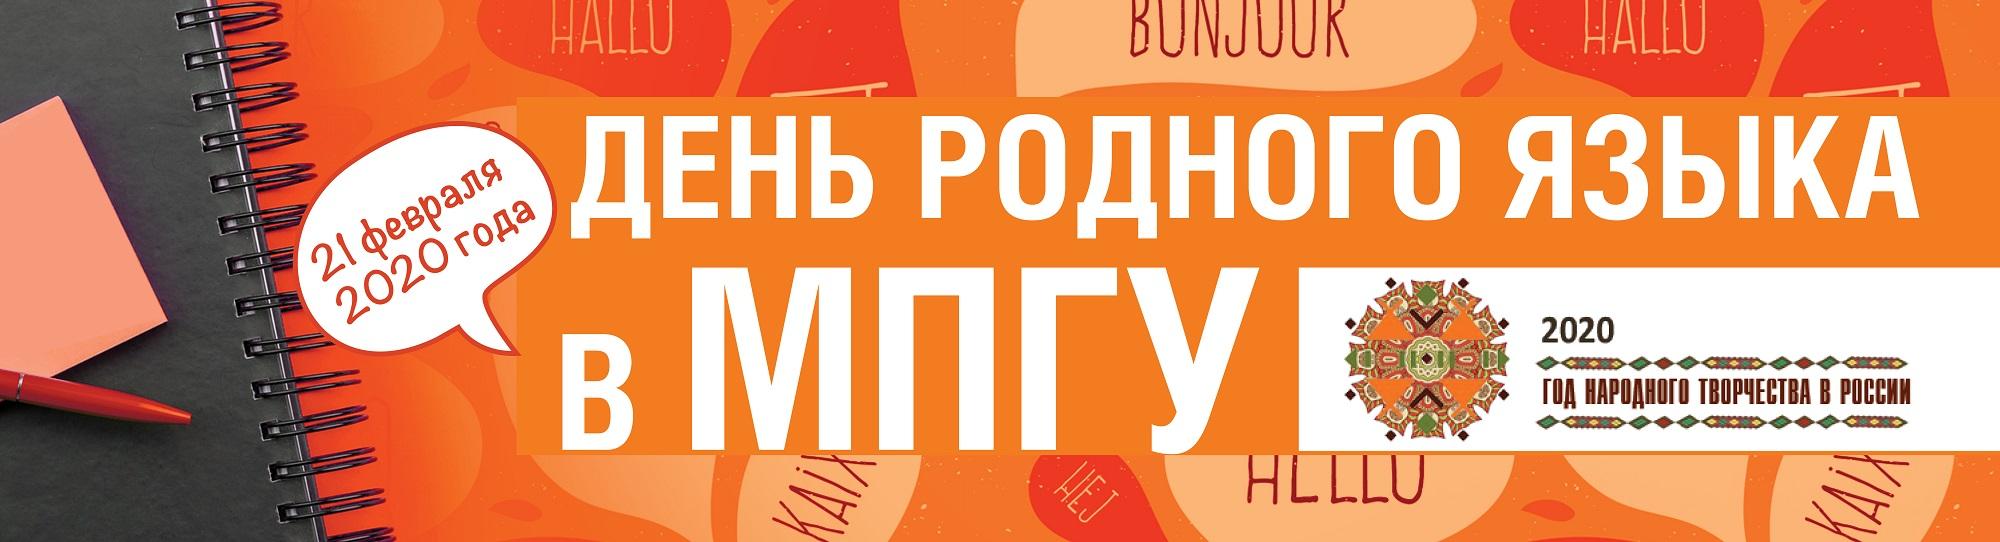 Баннер ДРЯ_4-2